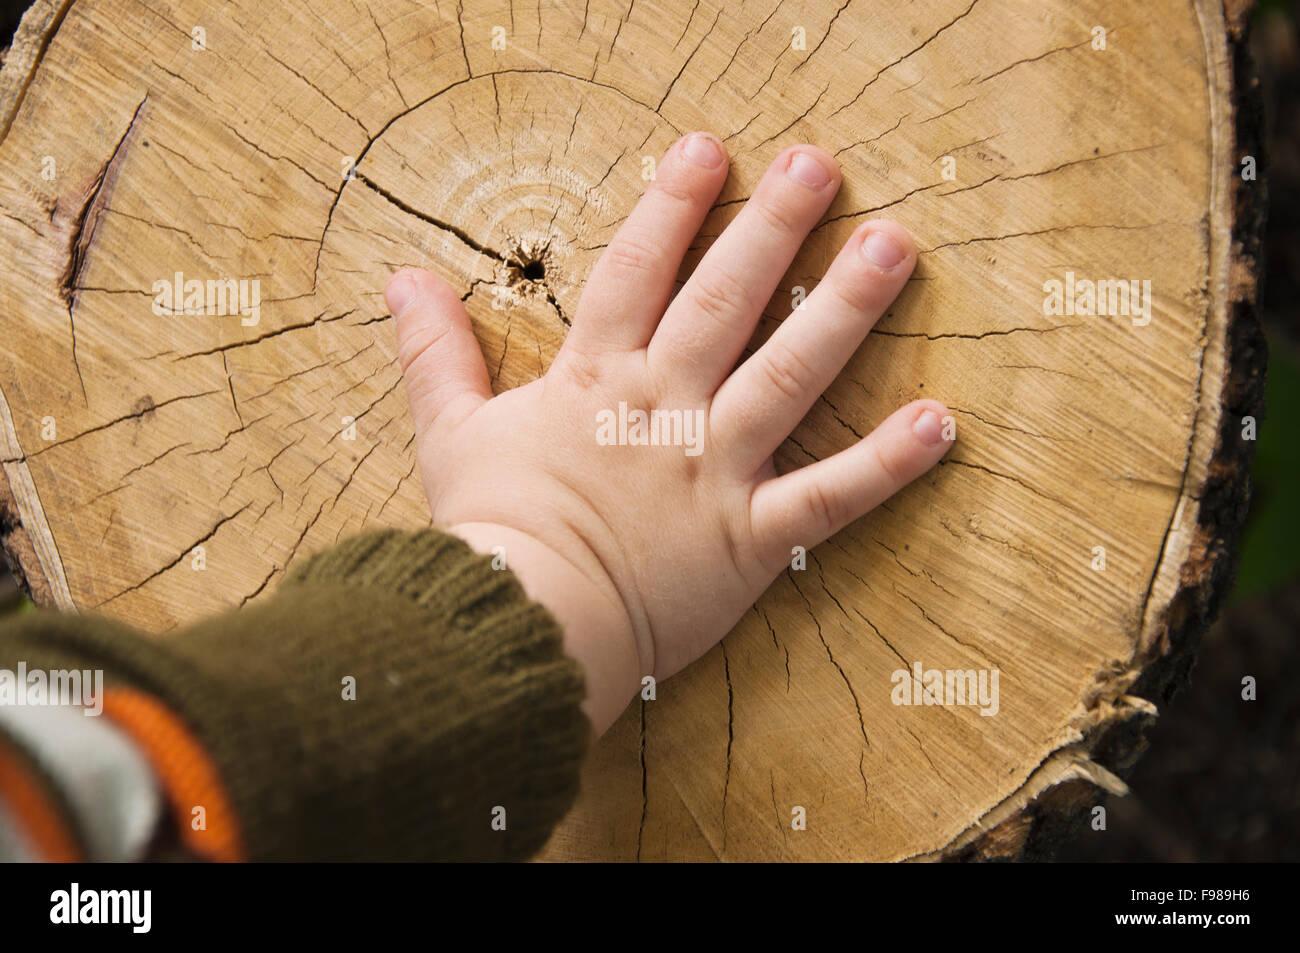 children's hand on stub - Stock Image